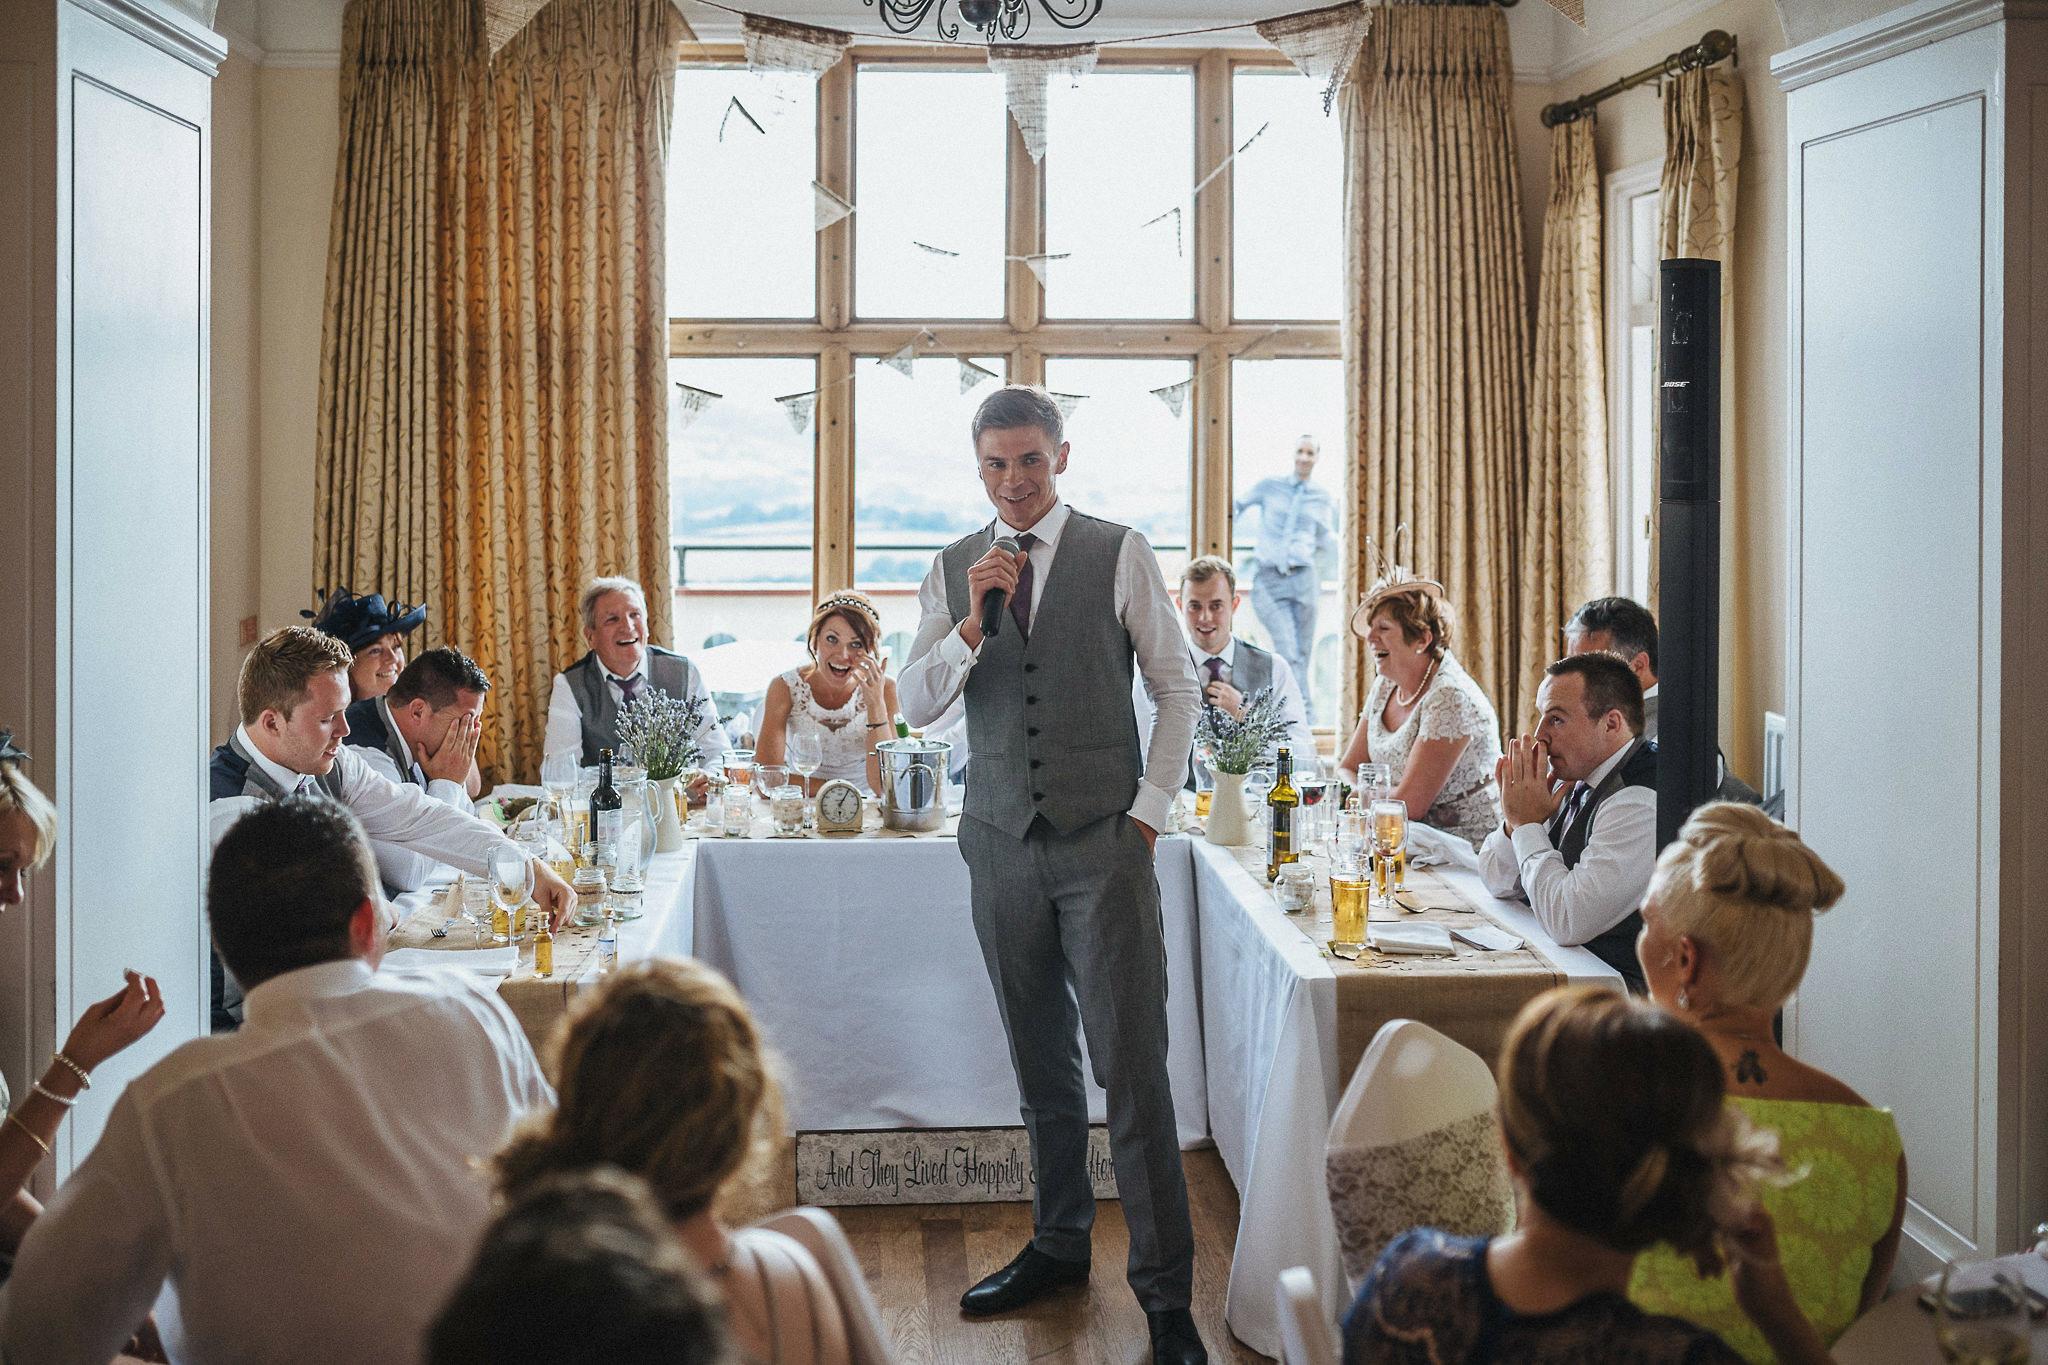 paul-marbrook-Caer-Llan-Wedding-Photographer-90081